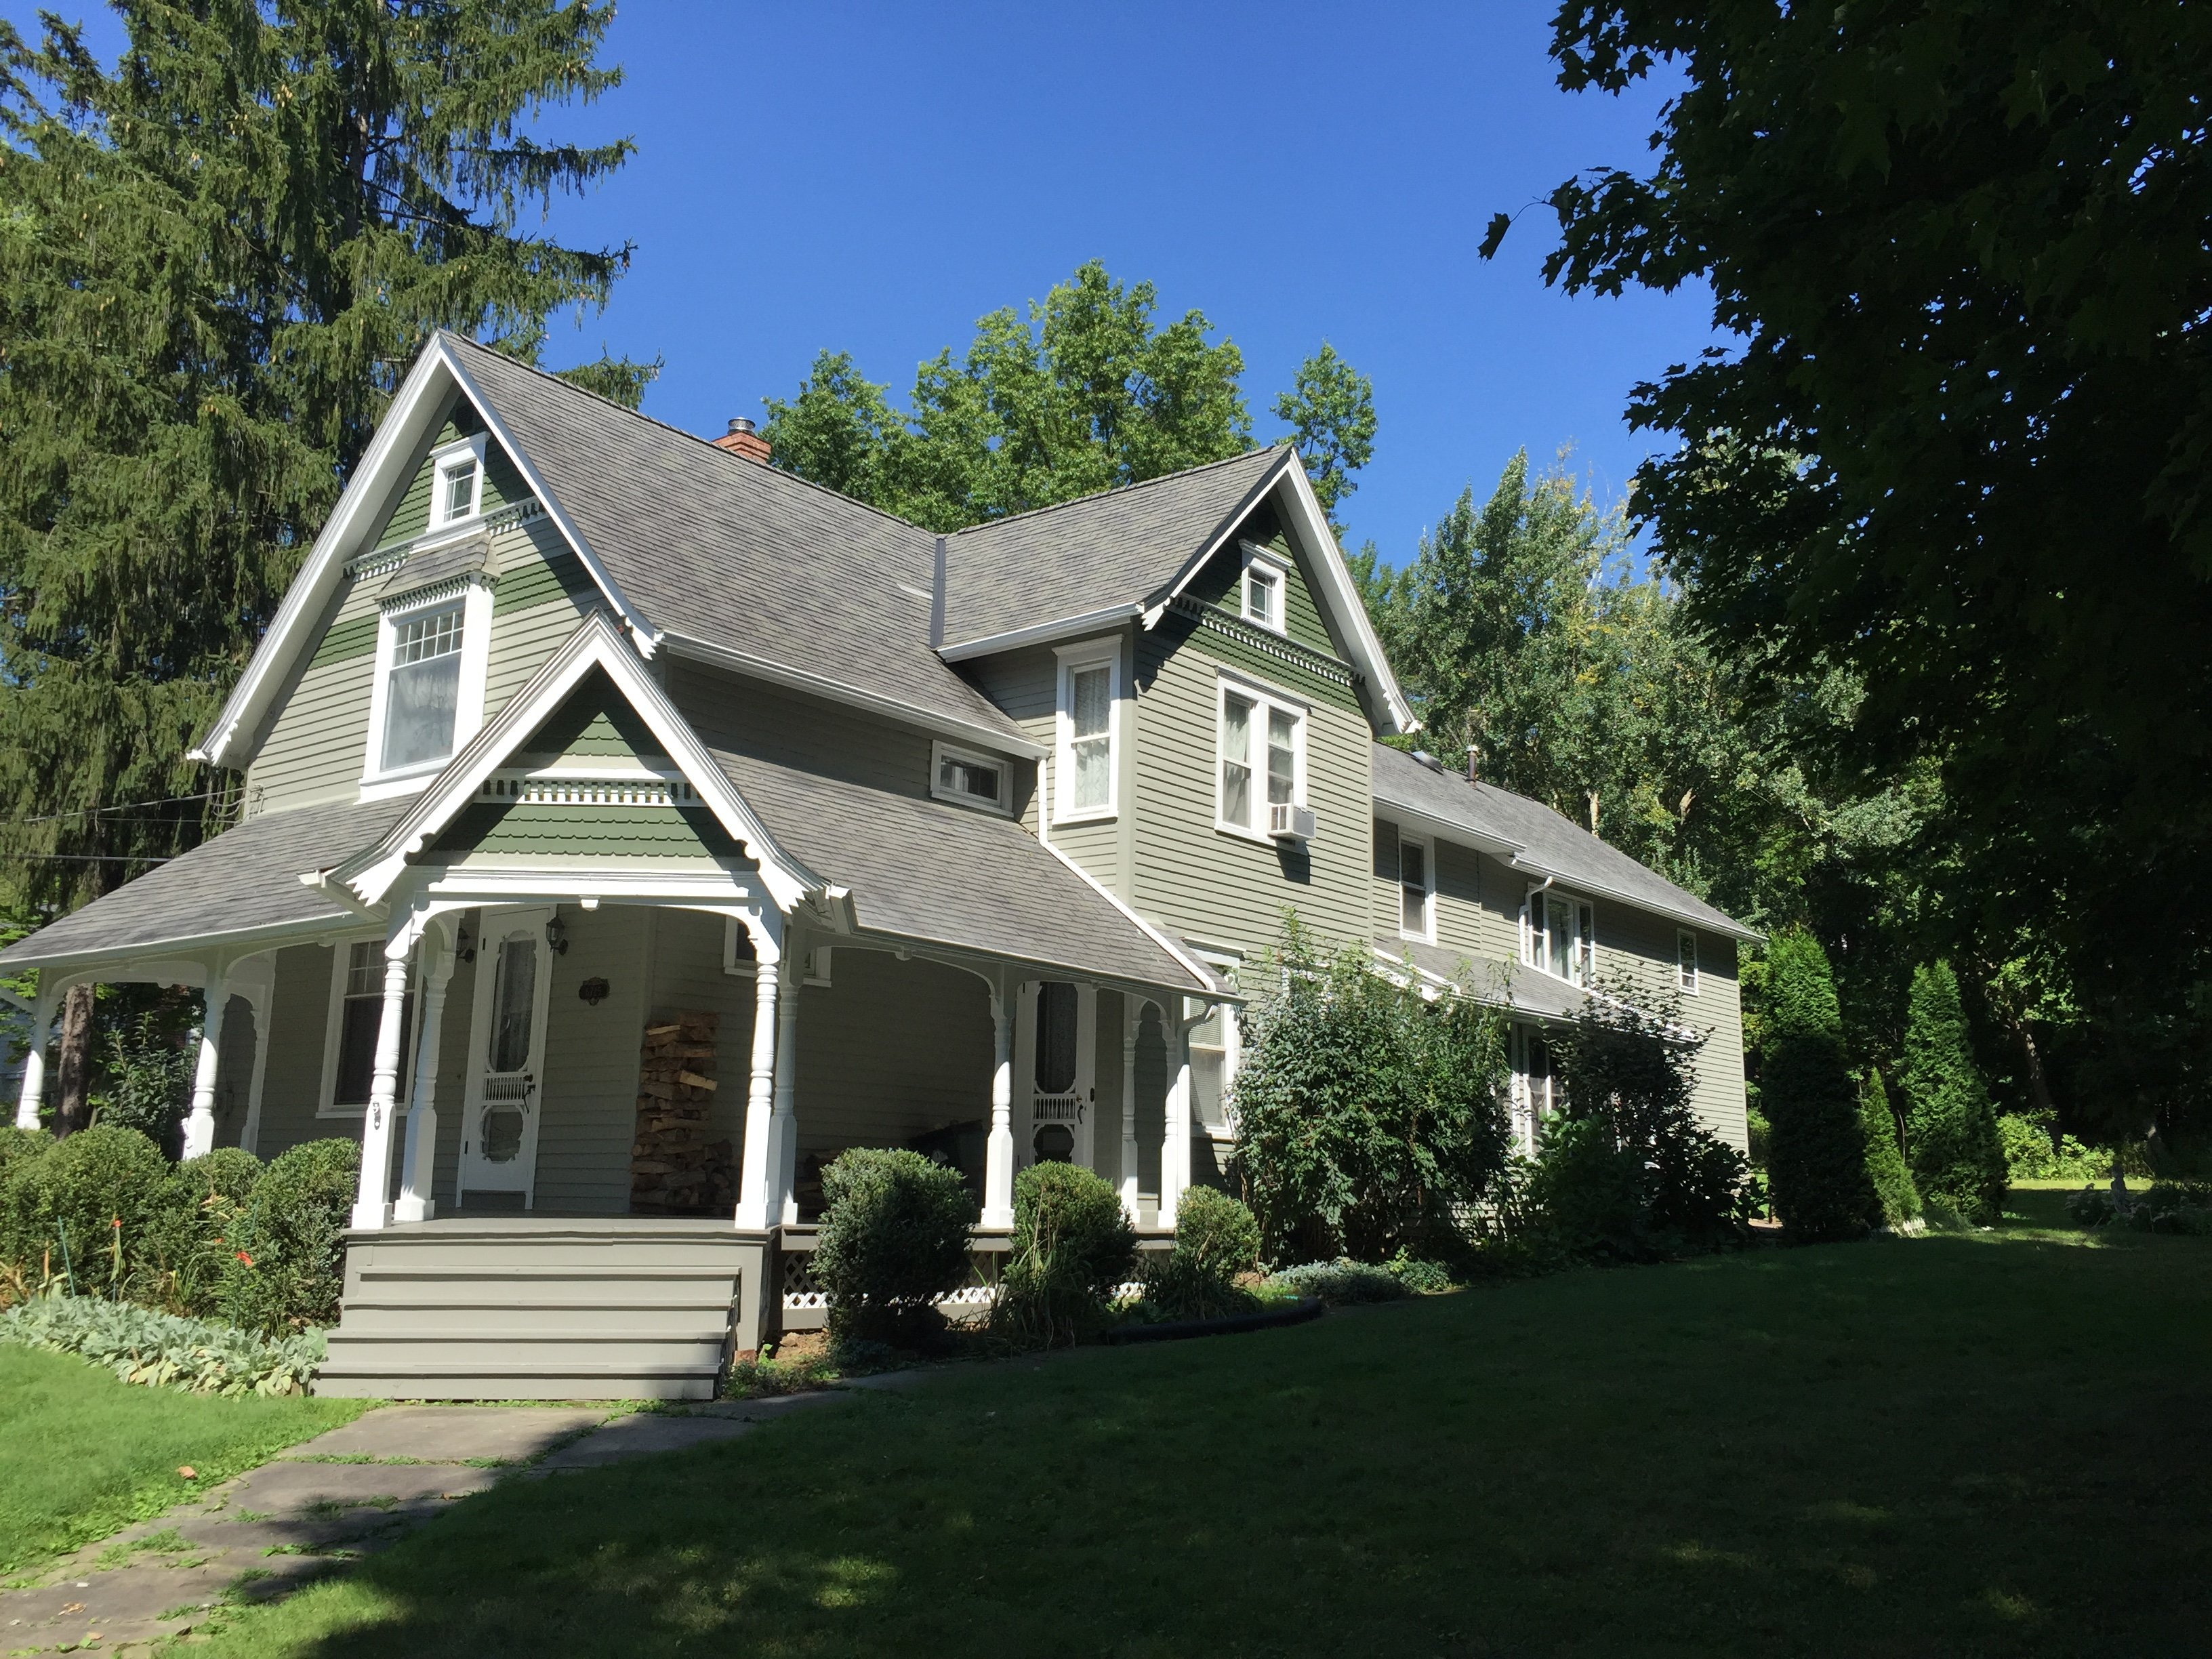 hiram-exterior-painting-restoration-contractors